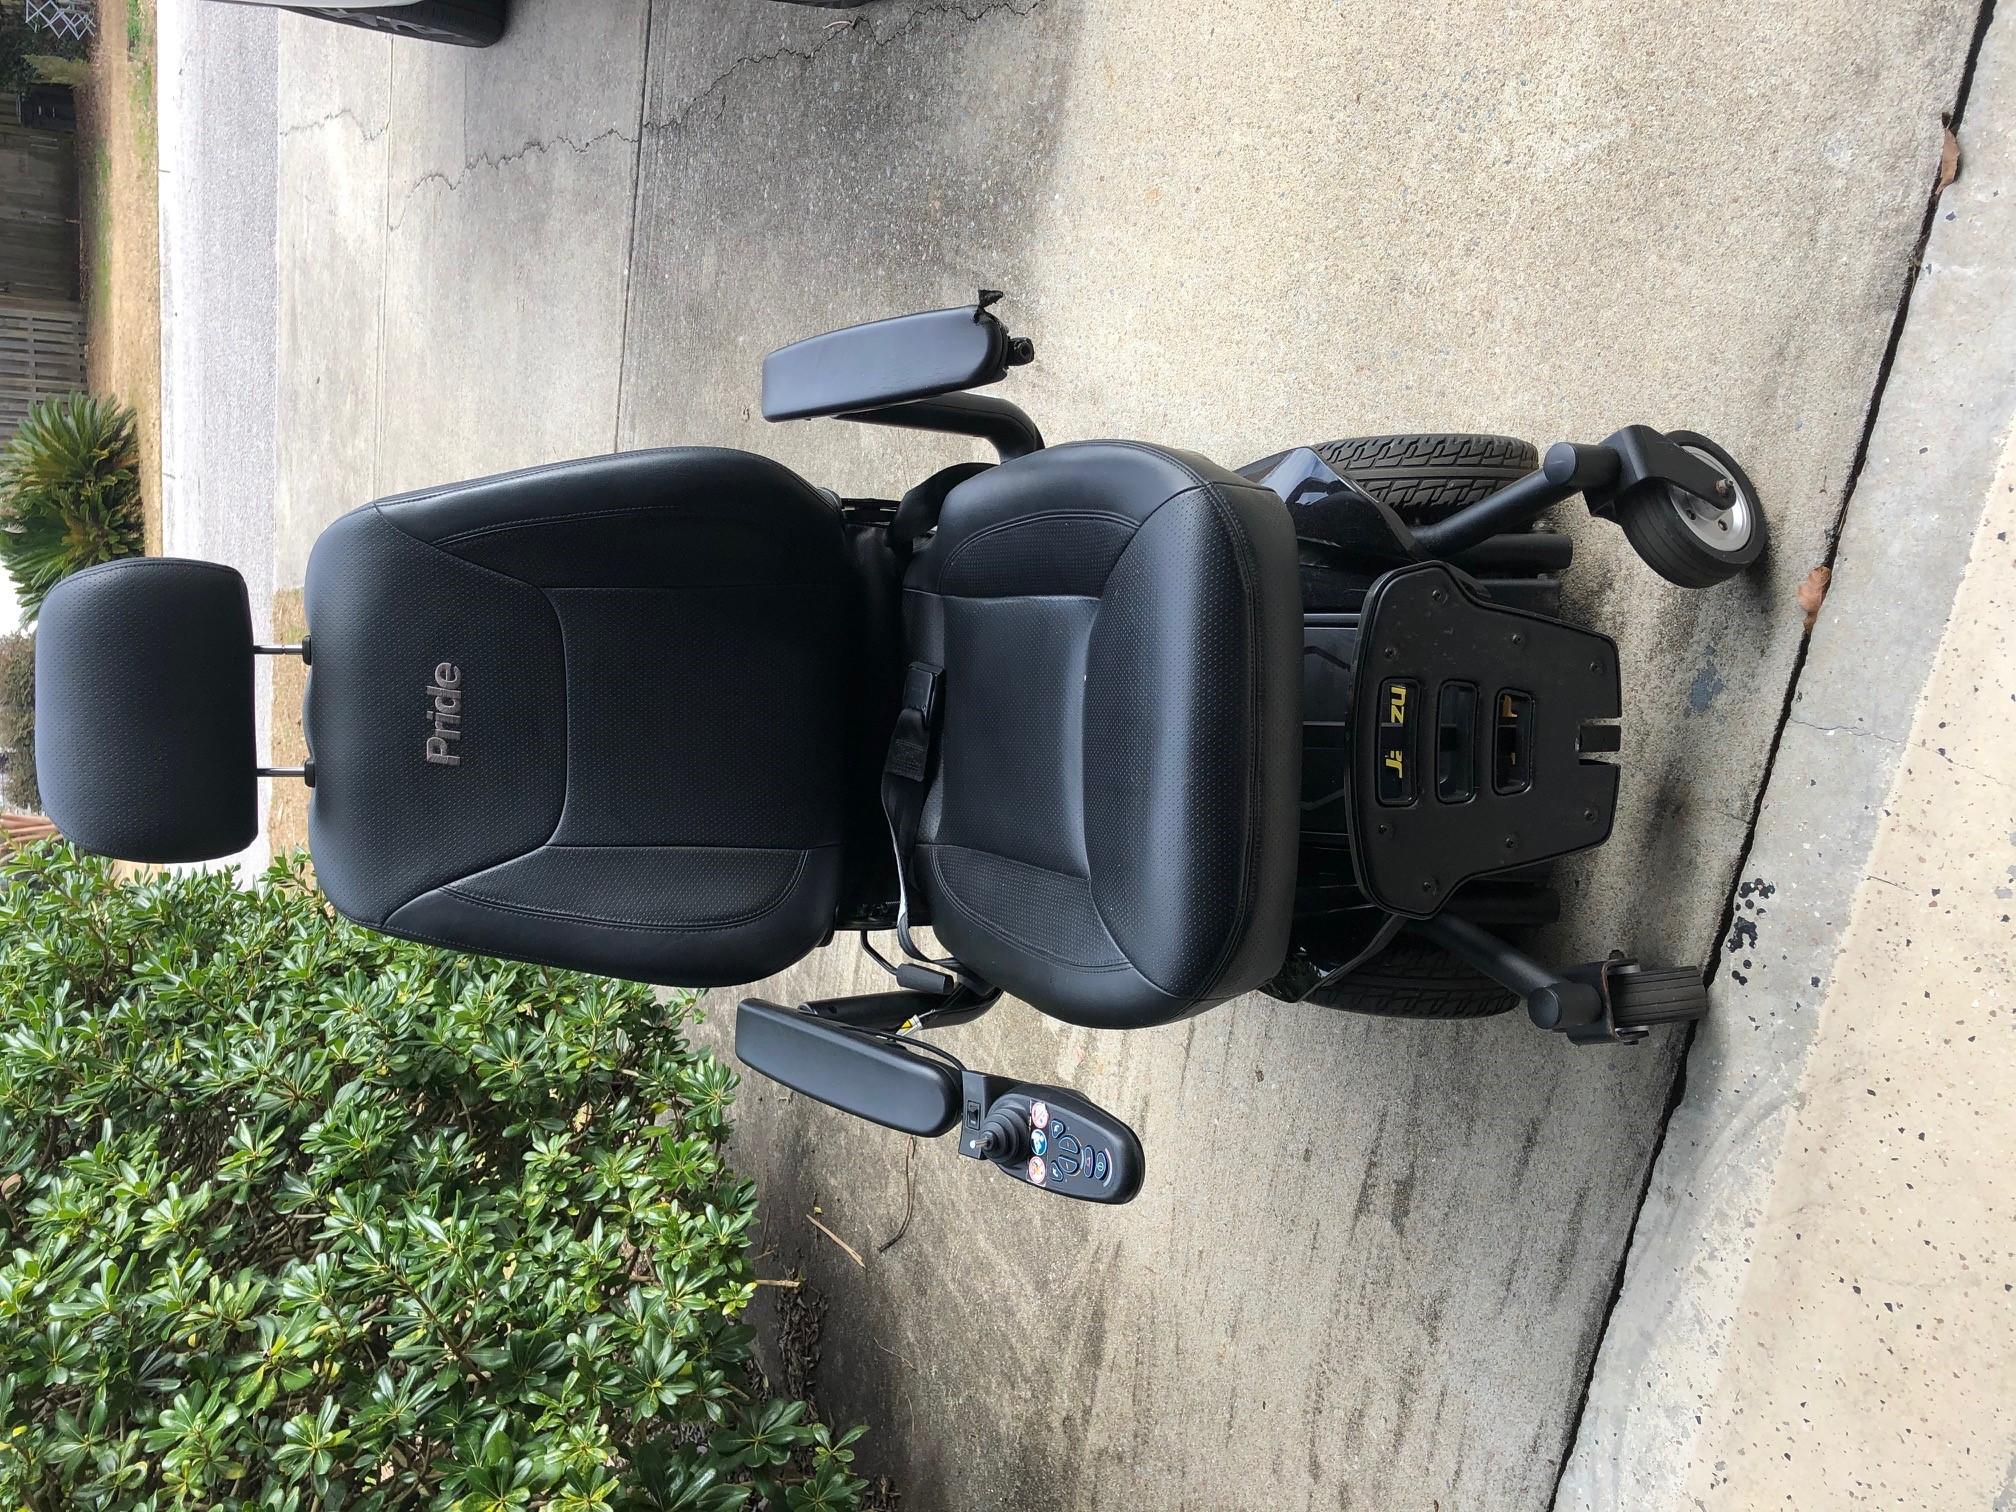 Photo 1 of Jazzy Motorized Wheelchair